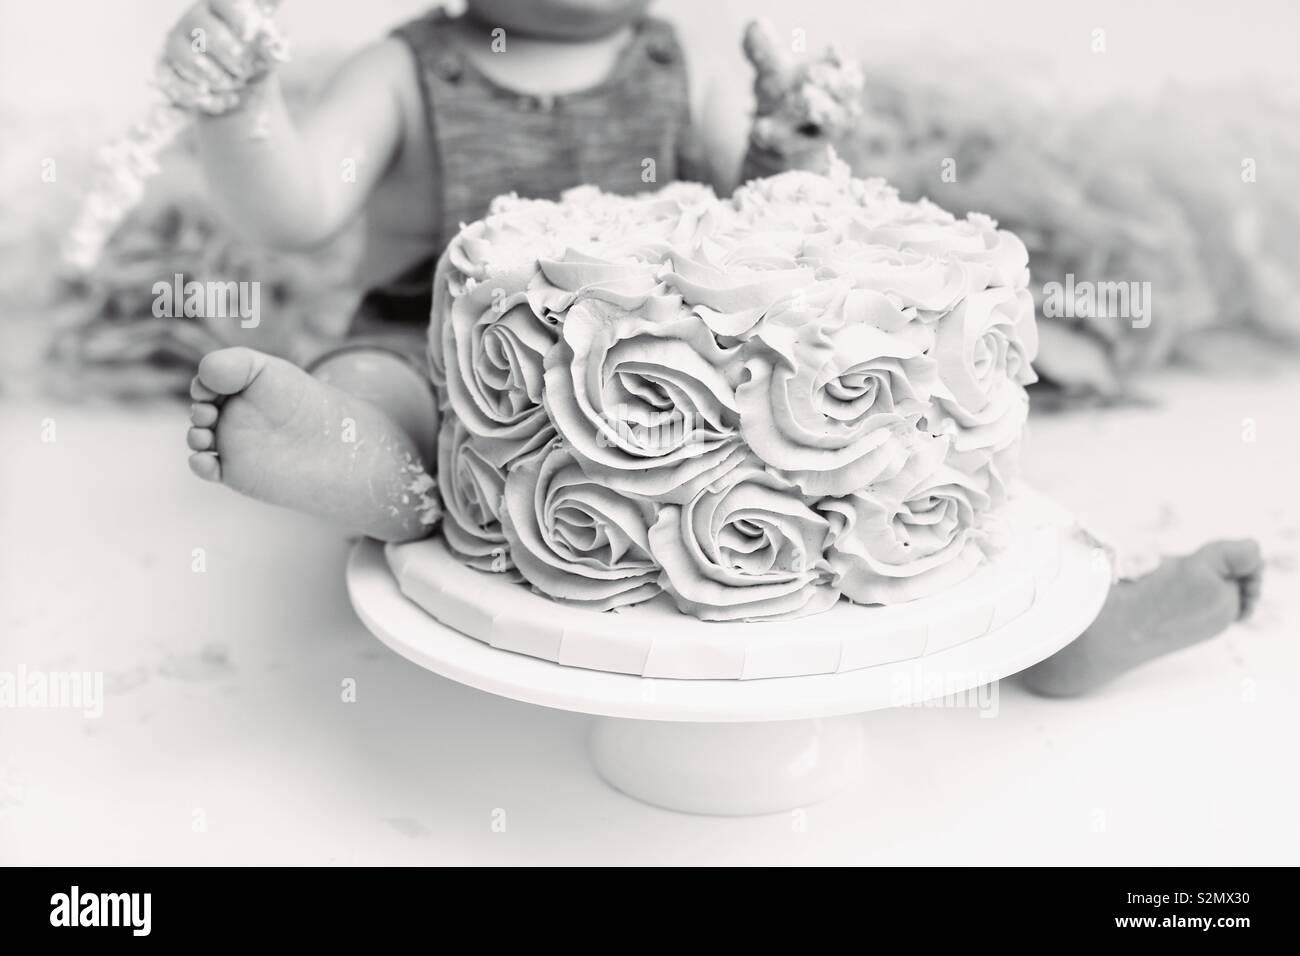 Birthday Cake - Stock Image